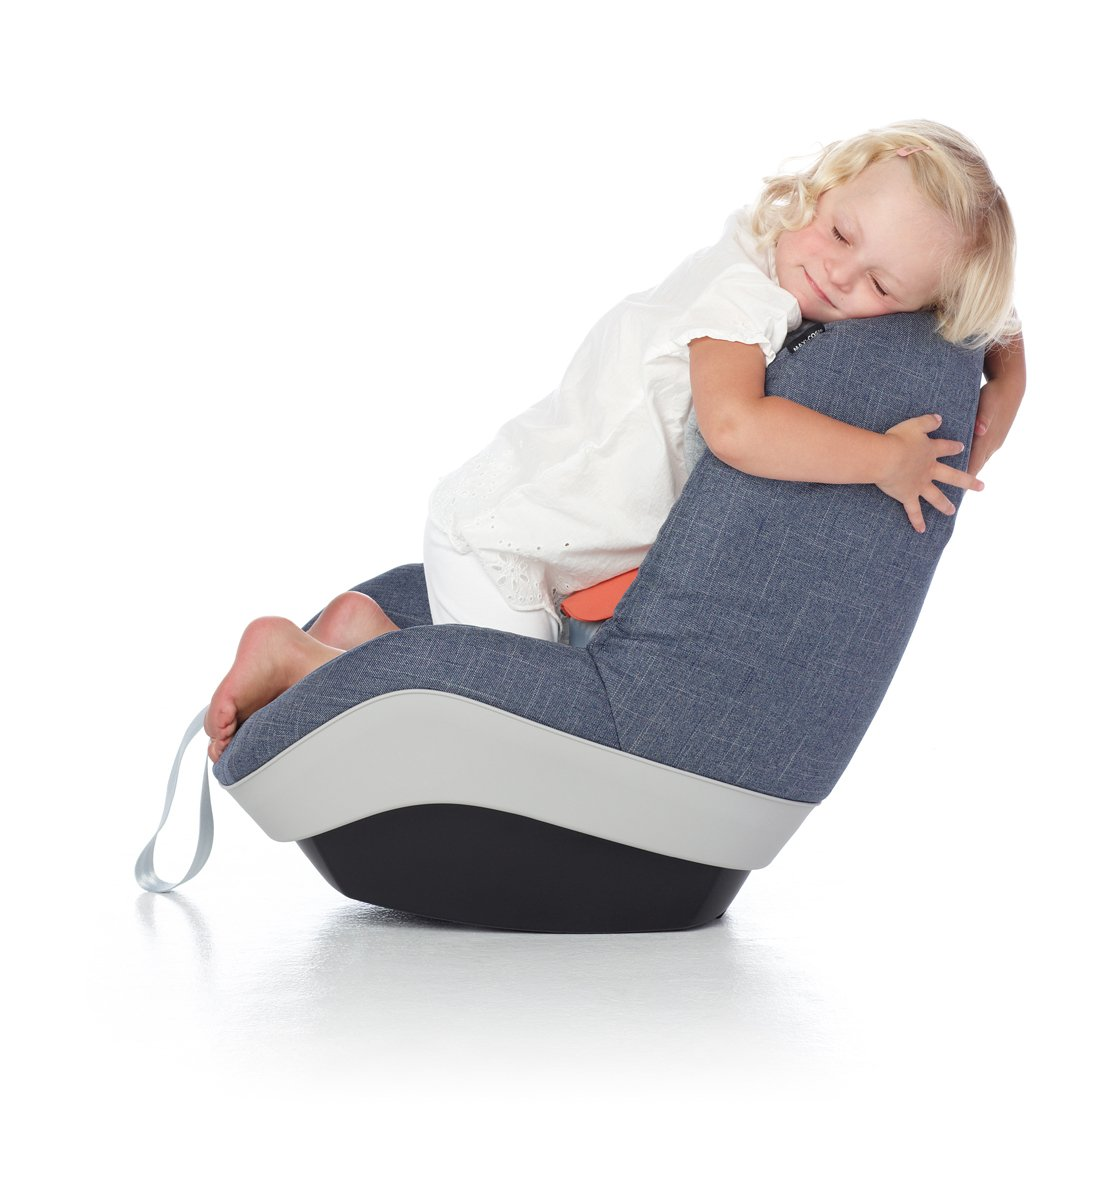 Maxi-Cosi 63409641Pearl Children's Seat, Group 1, 9-18kg Maxi-Cosi  12